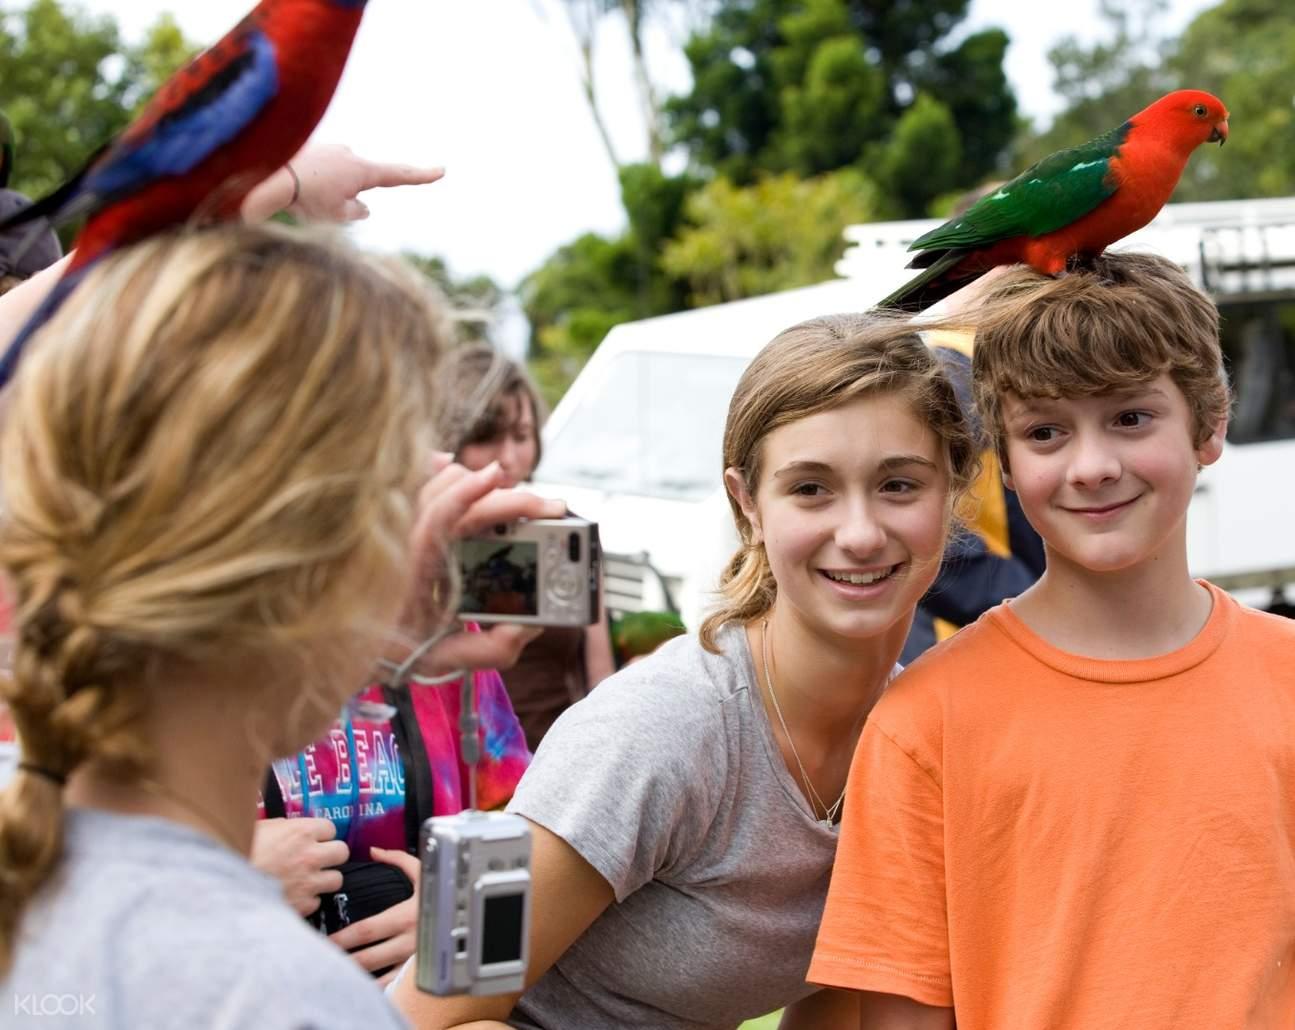 a girl and a boy posing with a bird on the boy's head